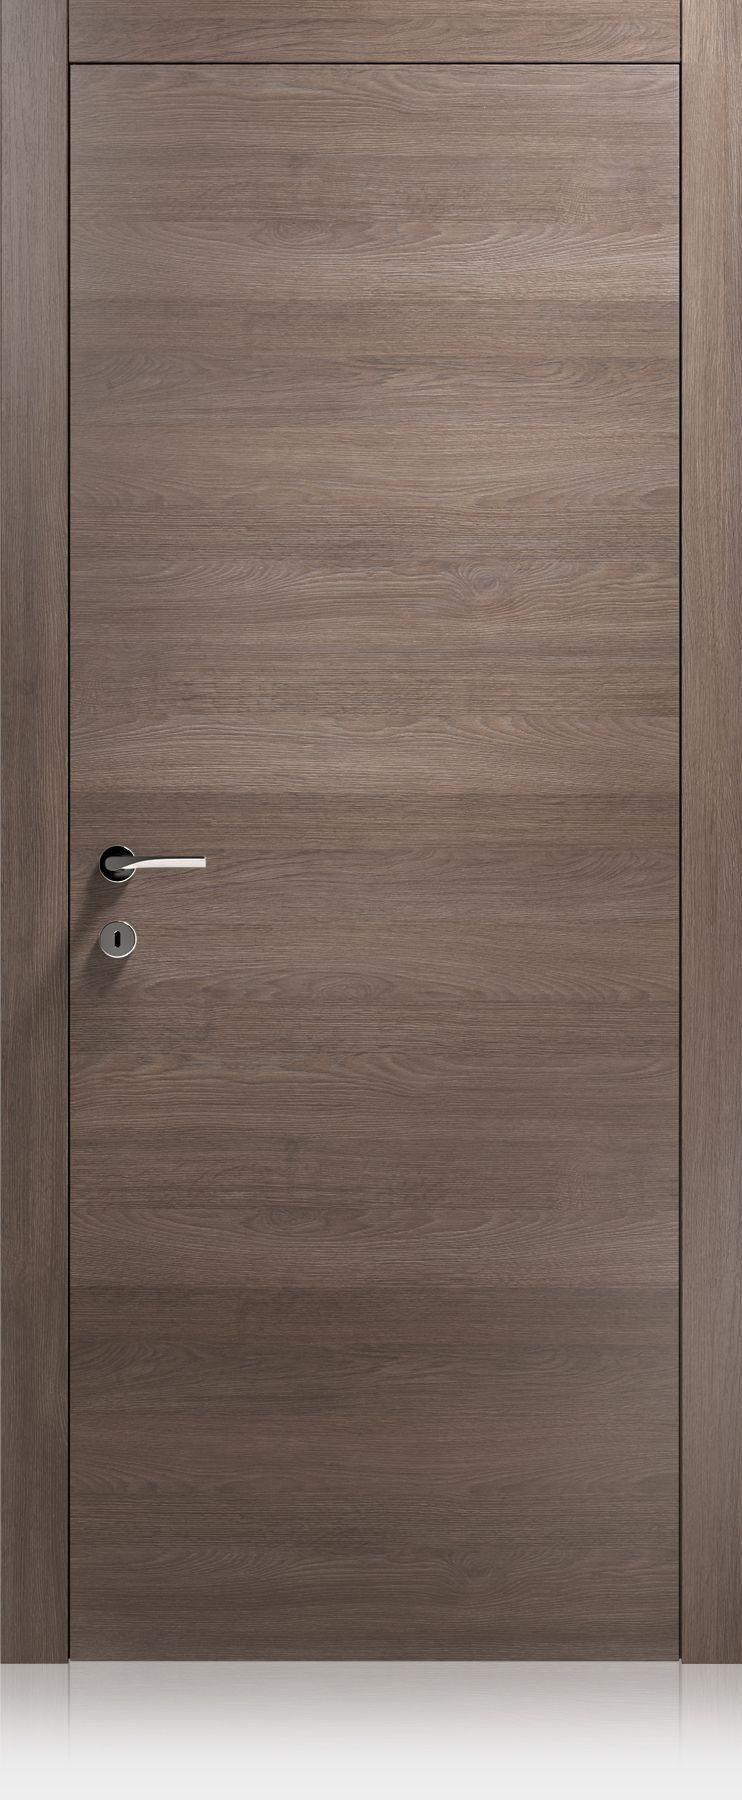 Ferrero Legno Porte / Replica / Logica / Ontario cuoio | Door ...